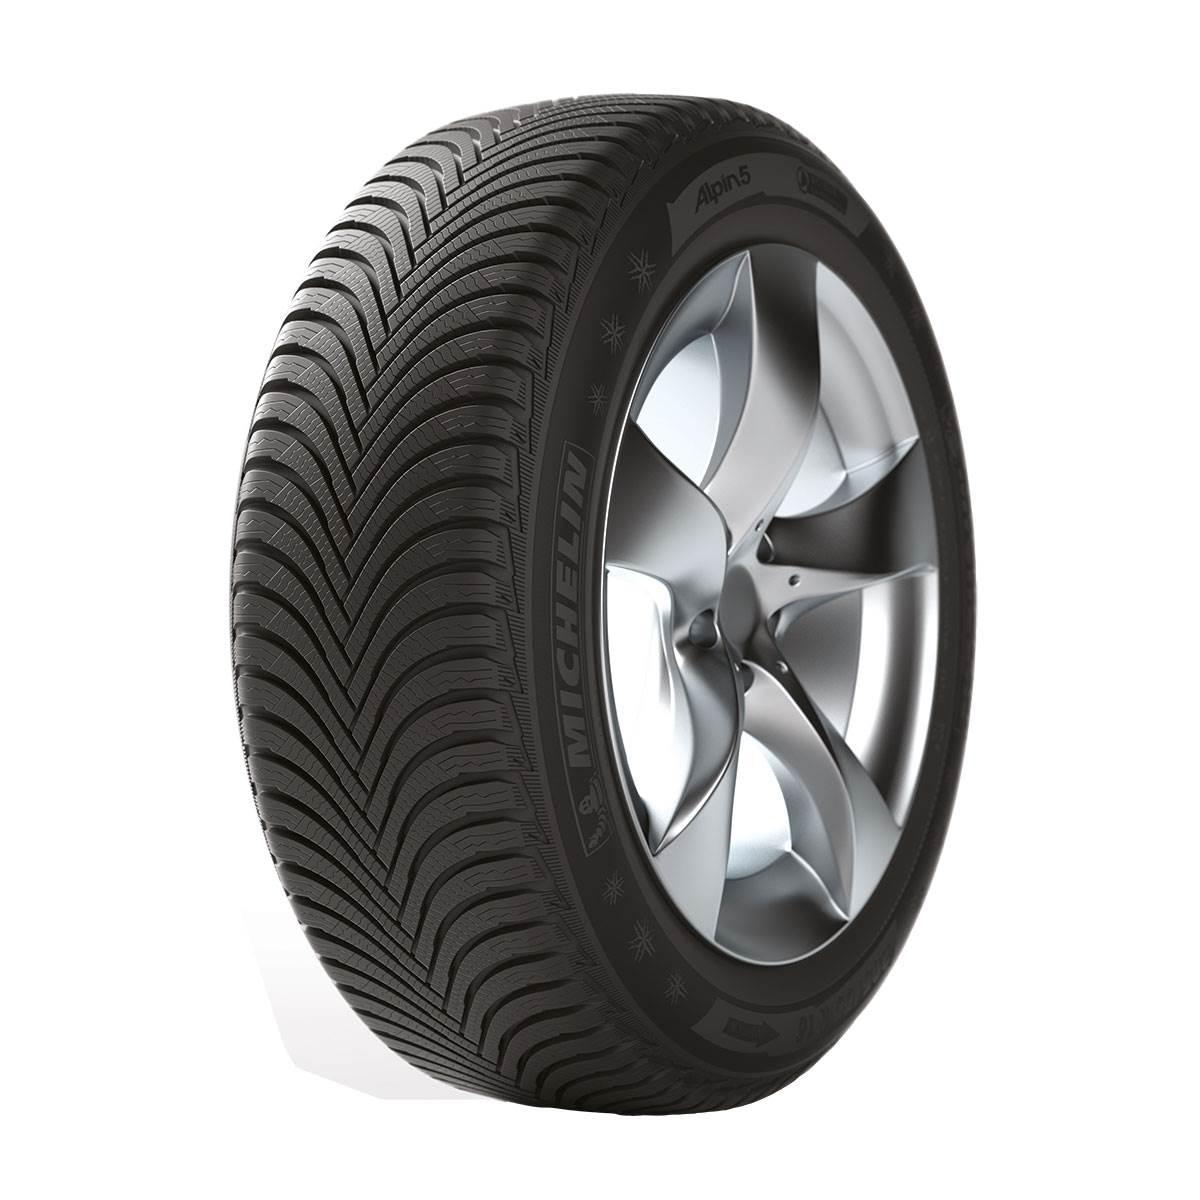 Pneu Hiver Michelin 205/65R15 94T Alpin A5